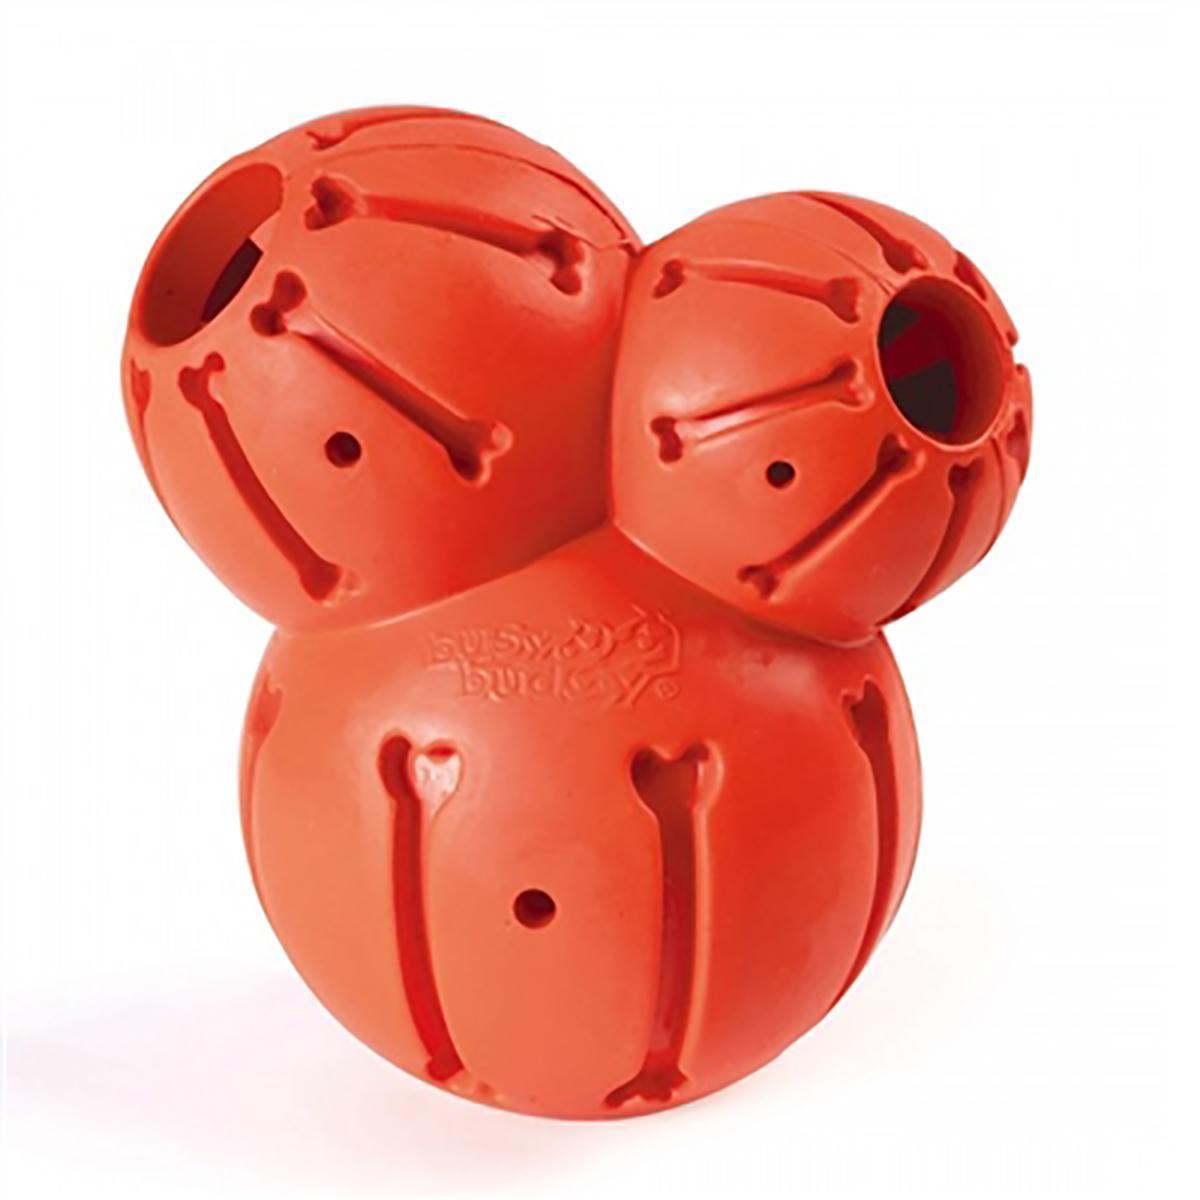 Busy Buddy Sportsmen Barnacle Dog Toy - Blaze Orange